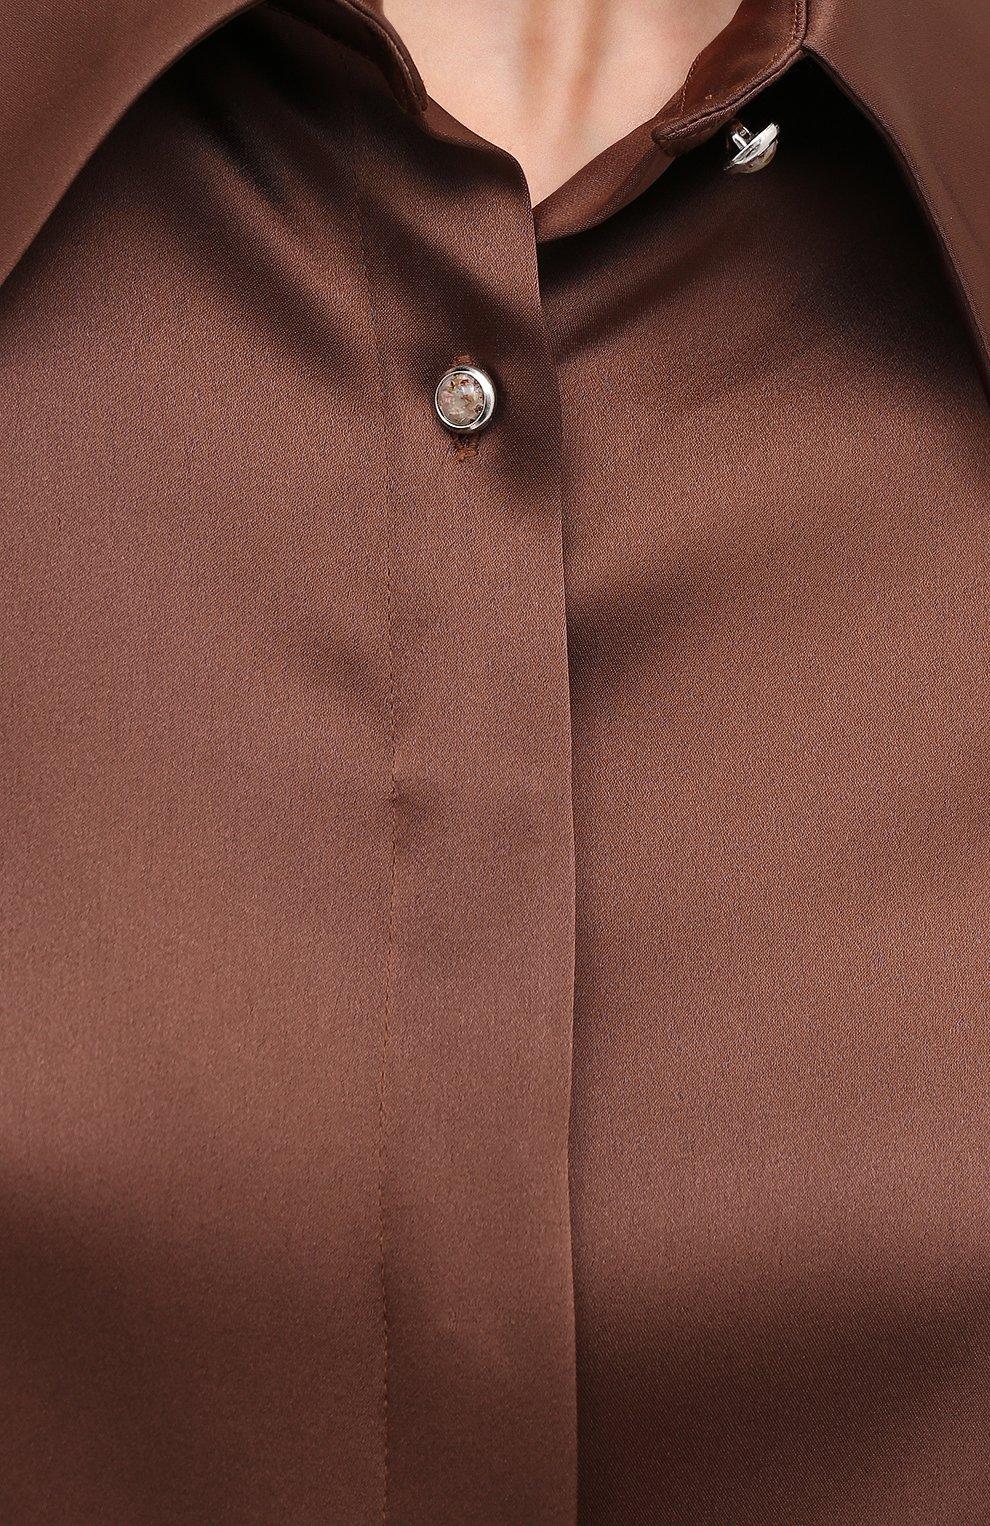 Женская блузка NANUSHKA коричневого цвета, арт. ALICE_BR0WN_SLIP SATIN   Фото 5